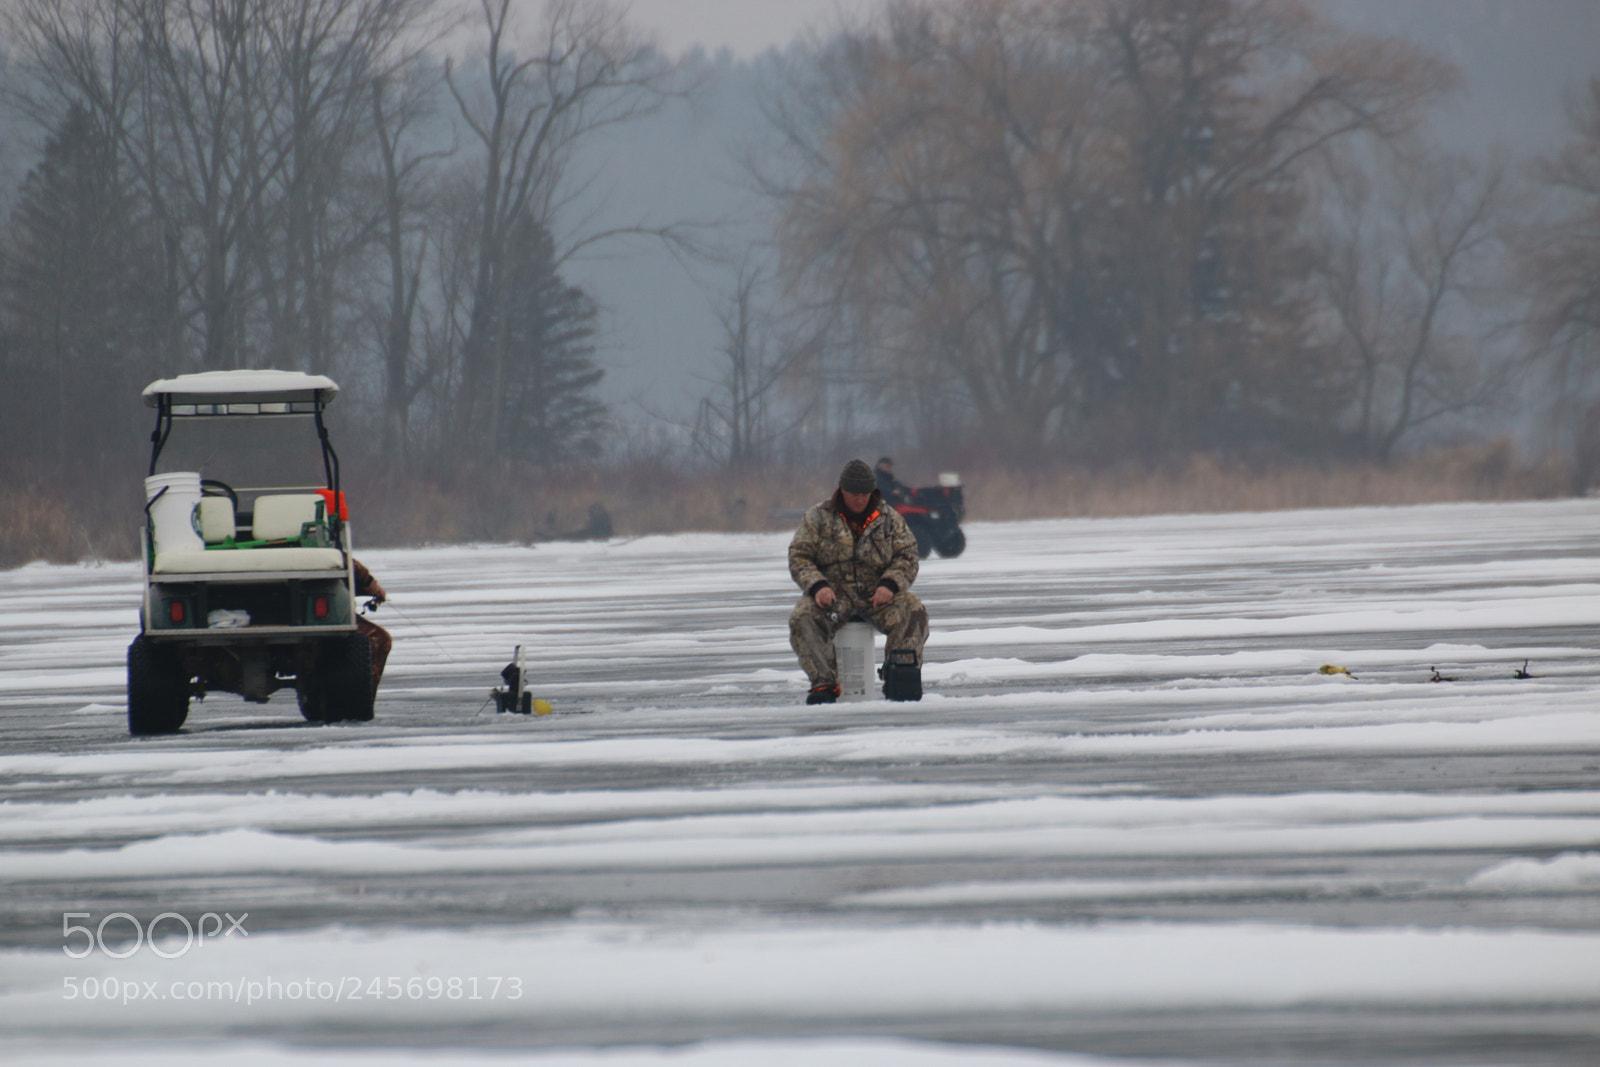 Man ice fishing, Canon EOS 70D, Sigma 50-500mm f/4.5-6.3 APO DG OS HSM